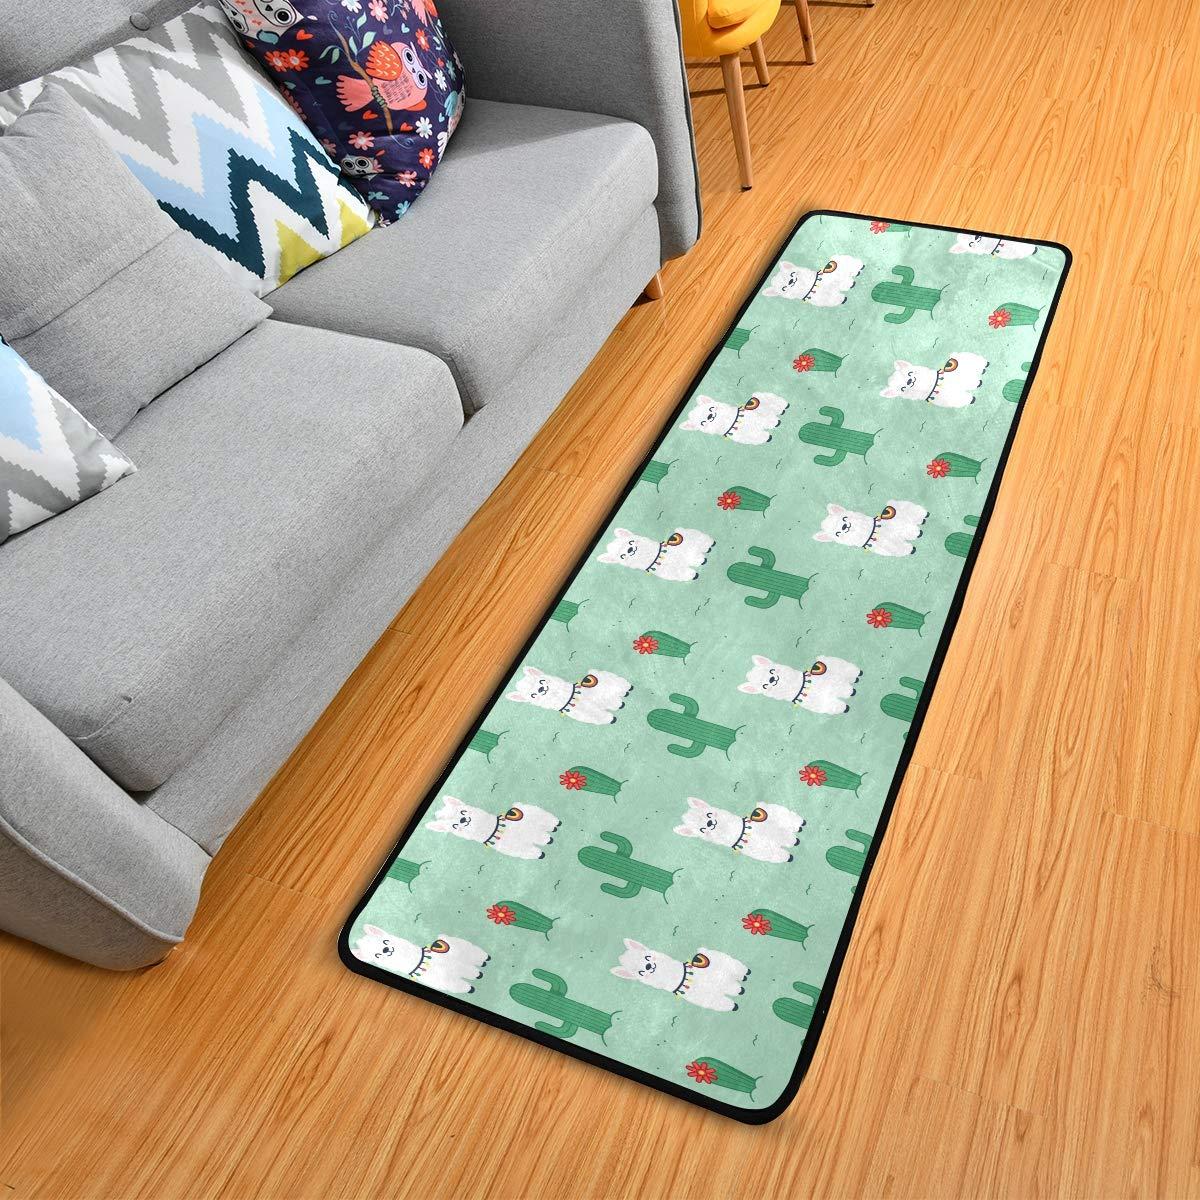 Hallway Runner Rug Rubber Backing - Llama Alpaca Runner Rug for Kitchen Rug Carpet Runner Non Skid Washable Rug Runner 2x6